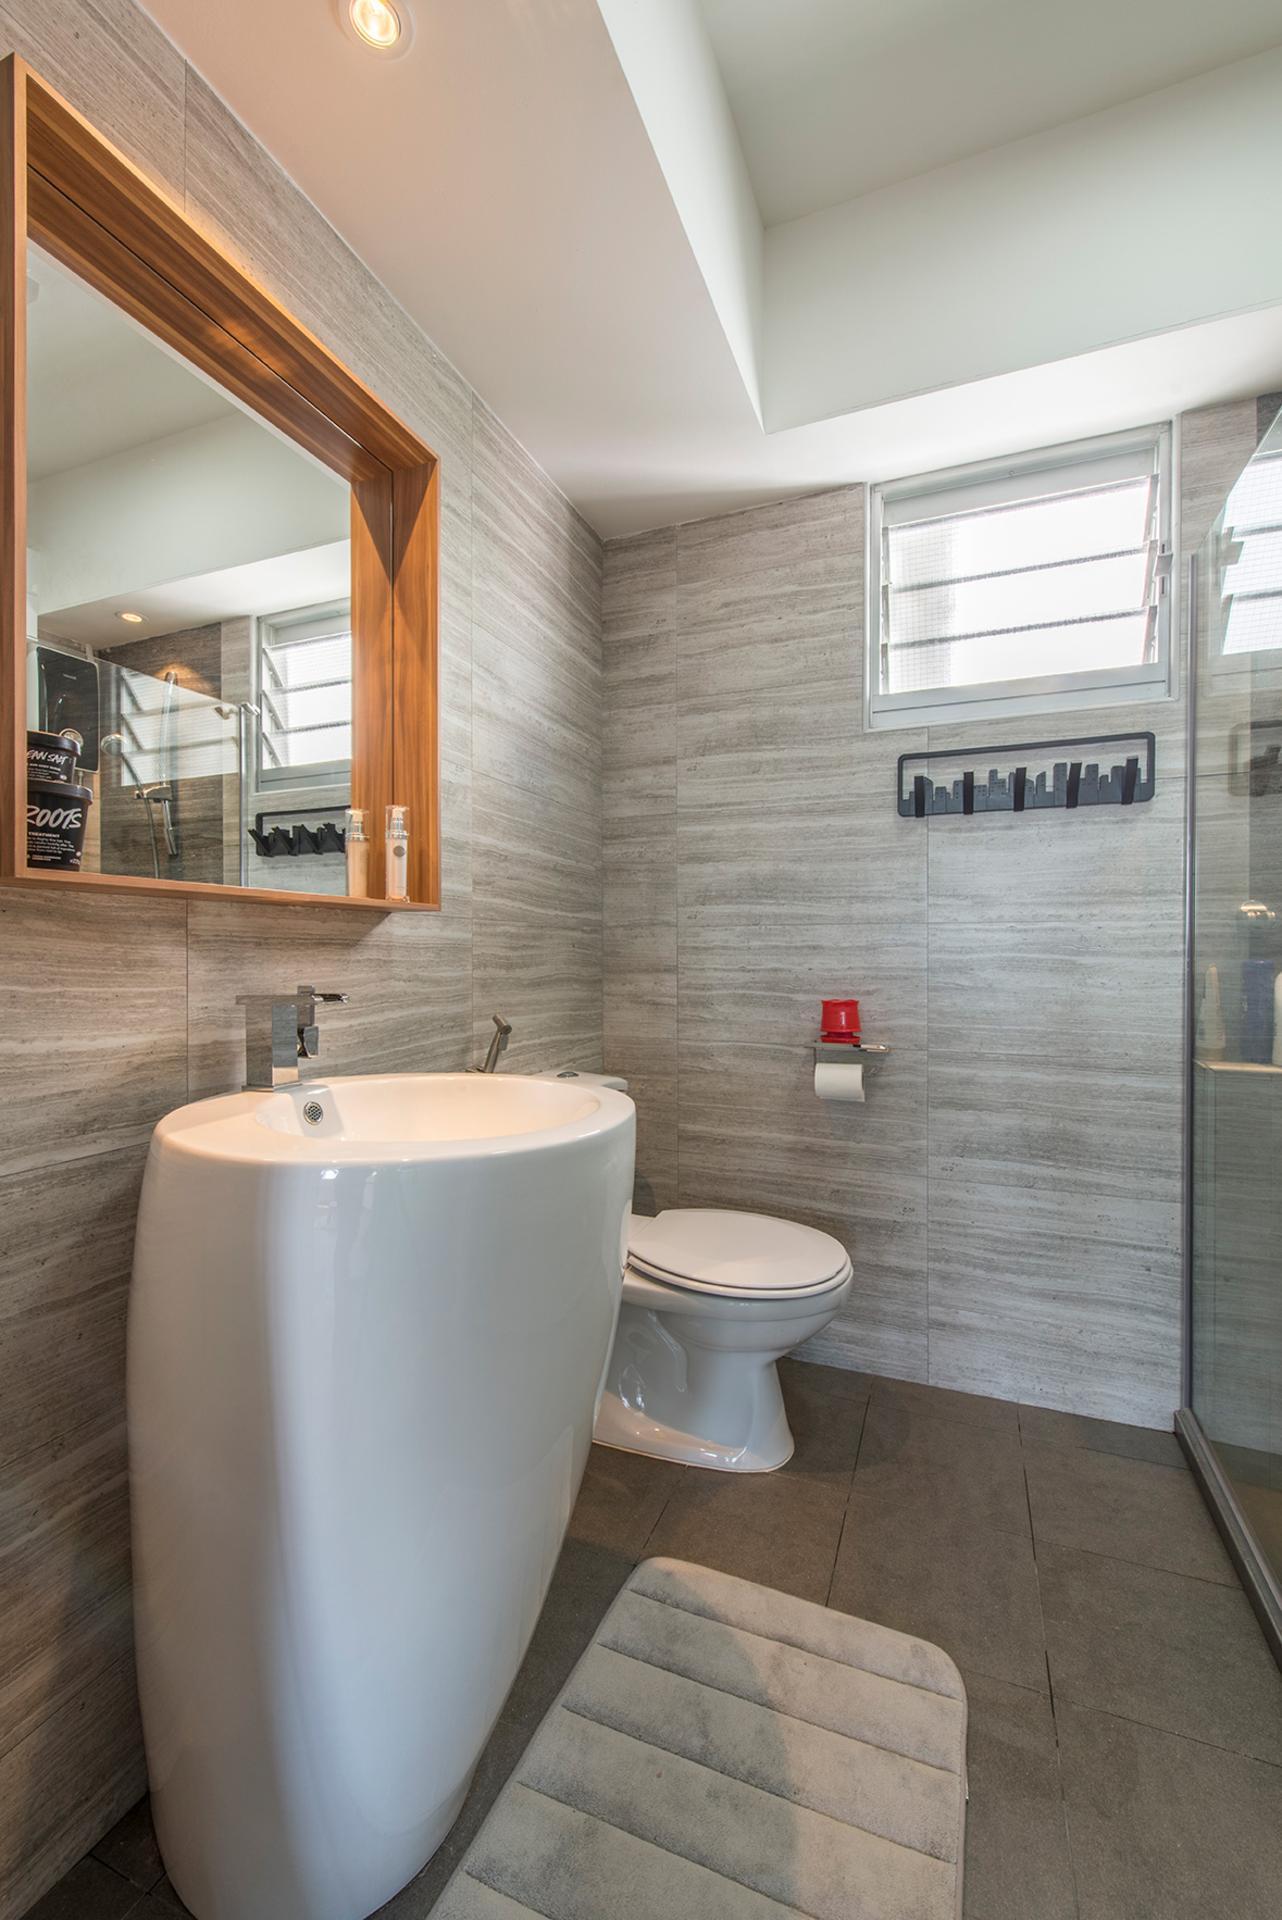 lim home design renovation works